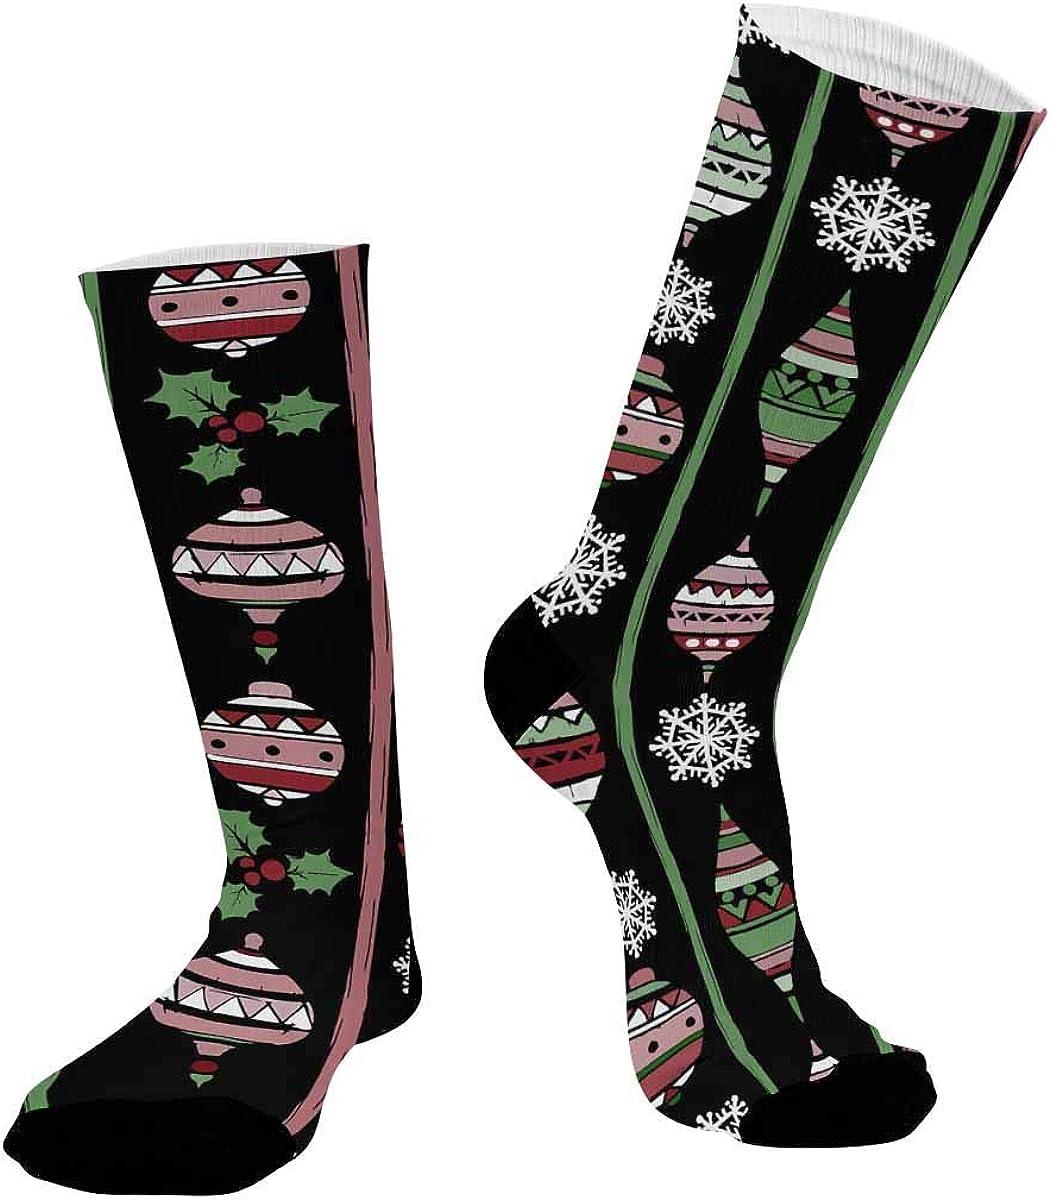 INTERESTPRINT Unisex Outdoor Sports Athletic Hiking Socks Holidays Vintage Christmas